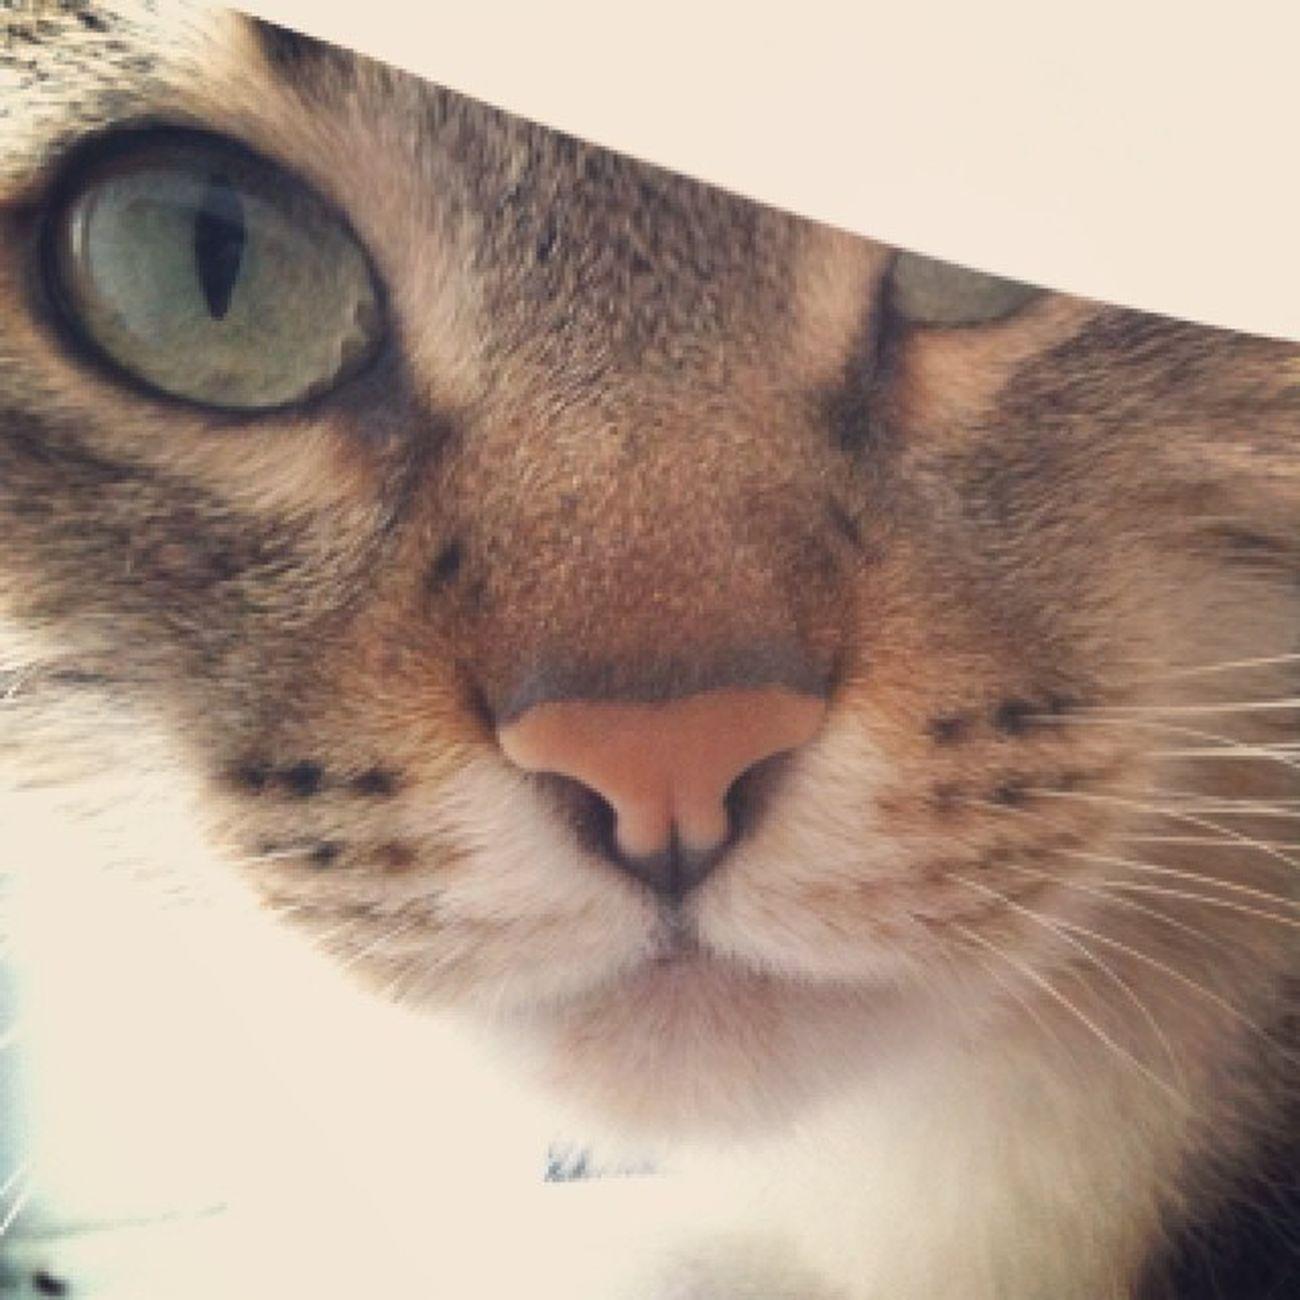 Instacat Instakitten Sweet Cat mycat white light green eyes cateyes noise instakedi tagsfortags